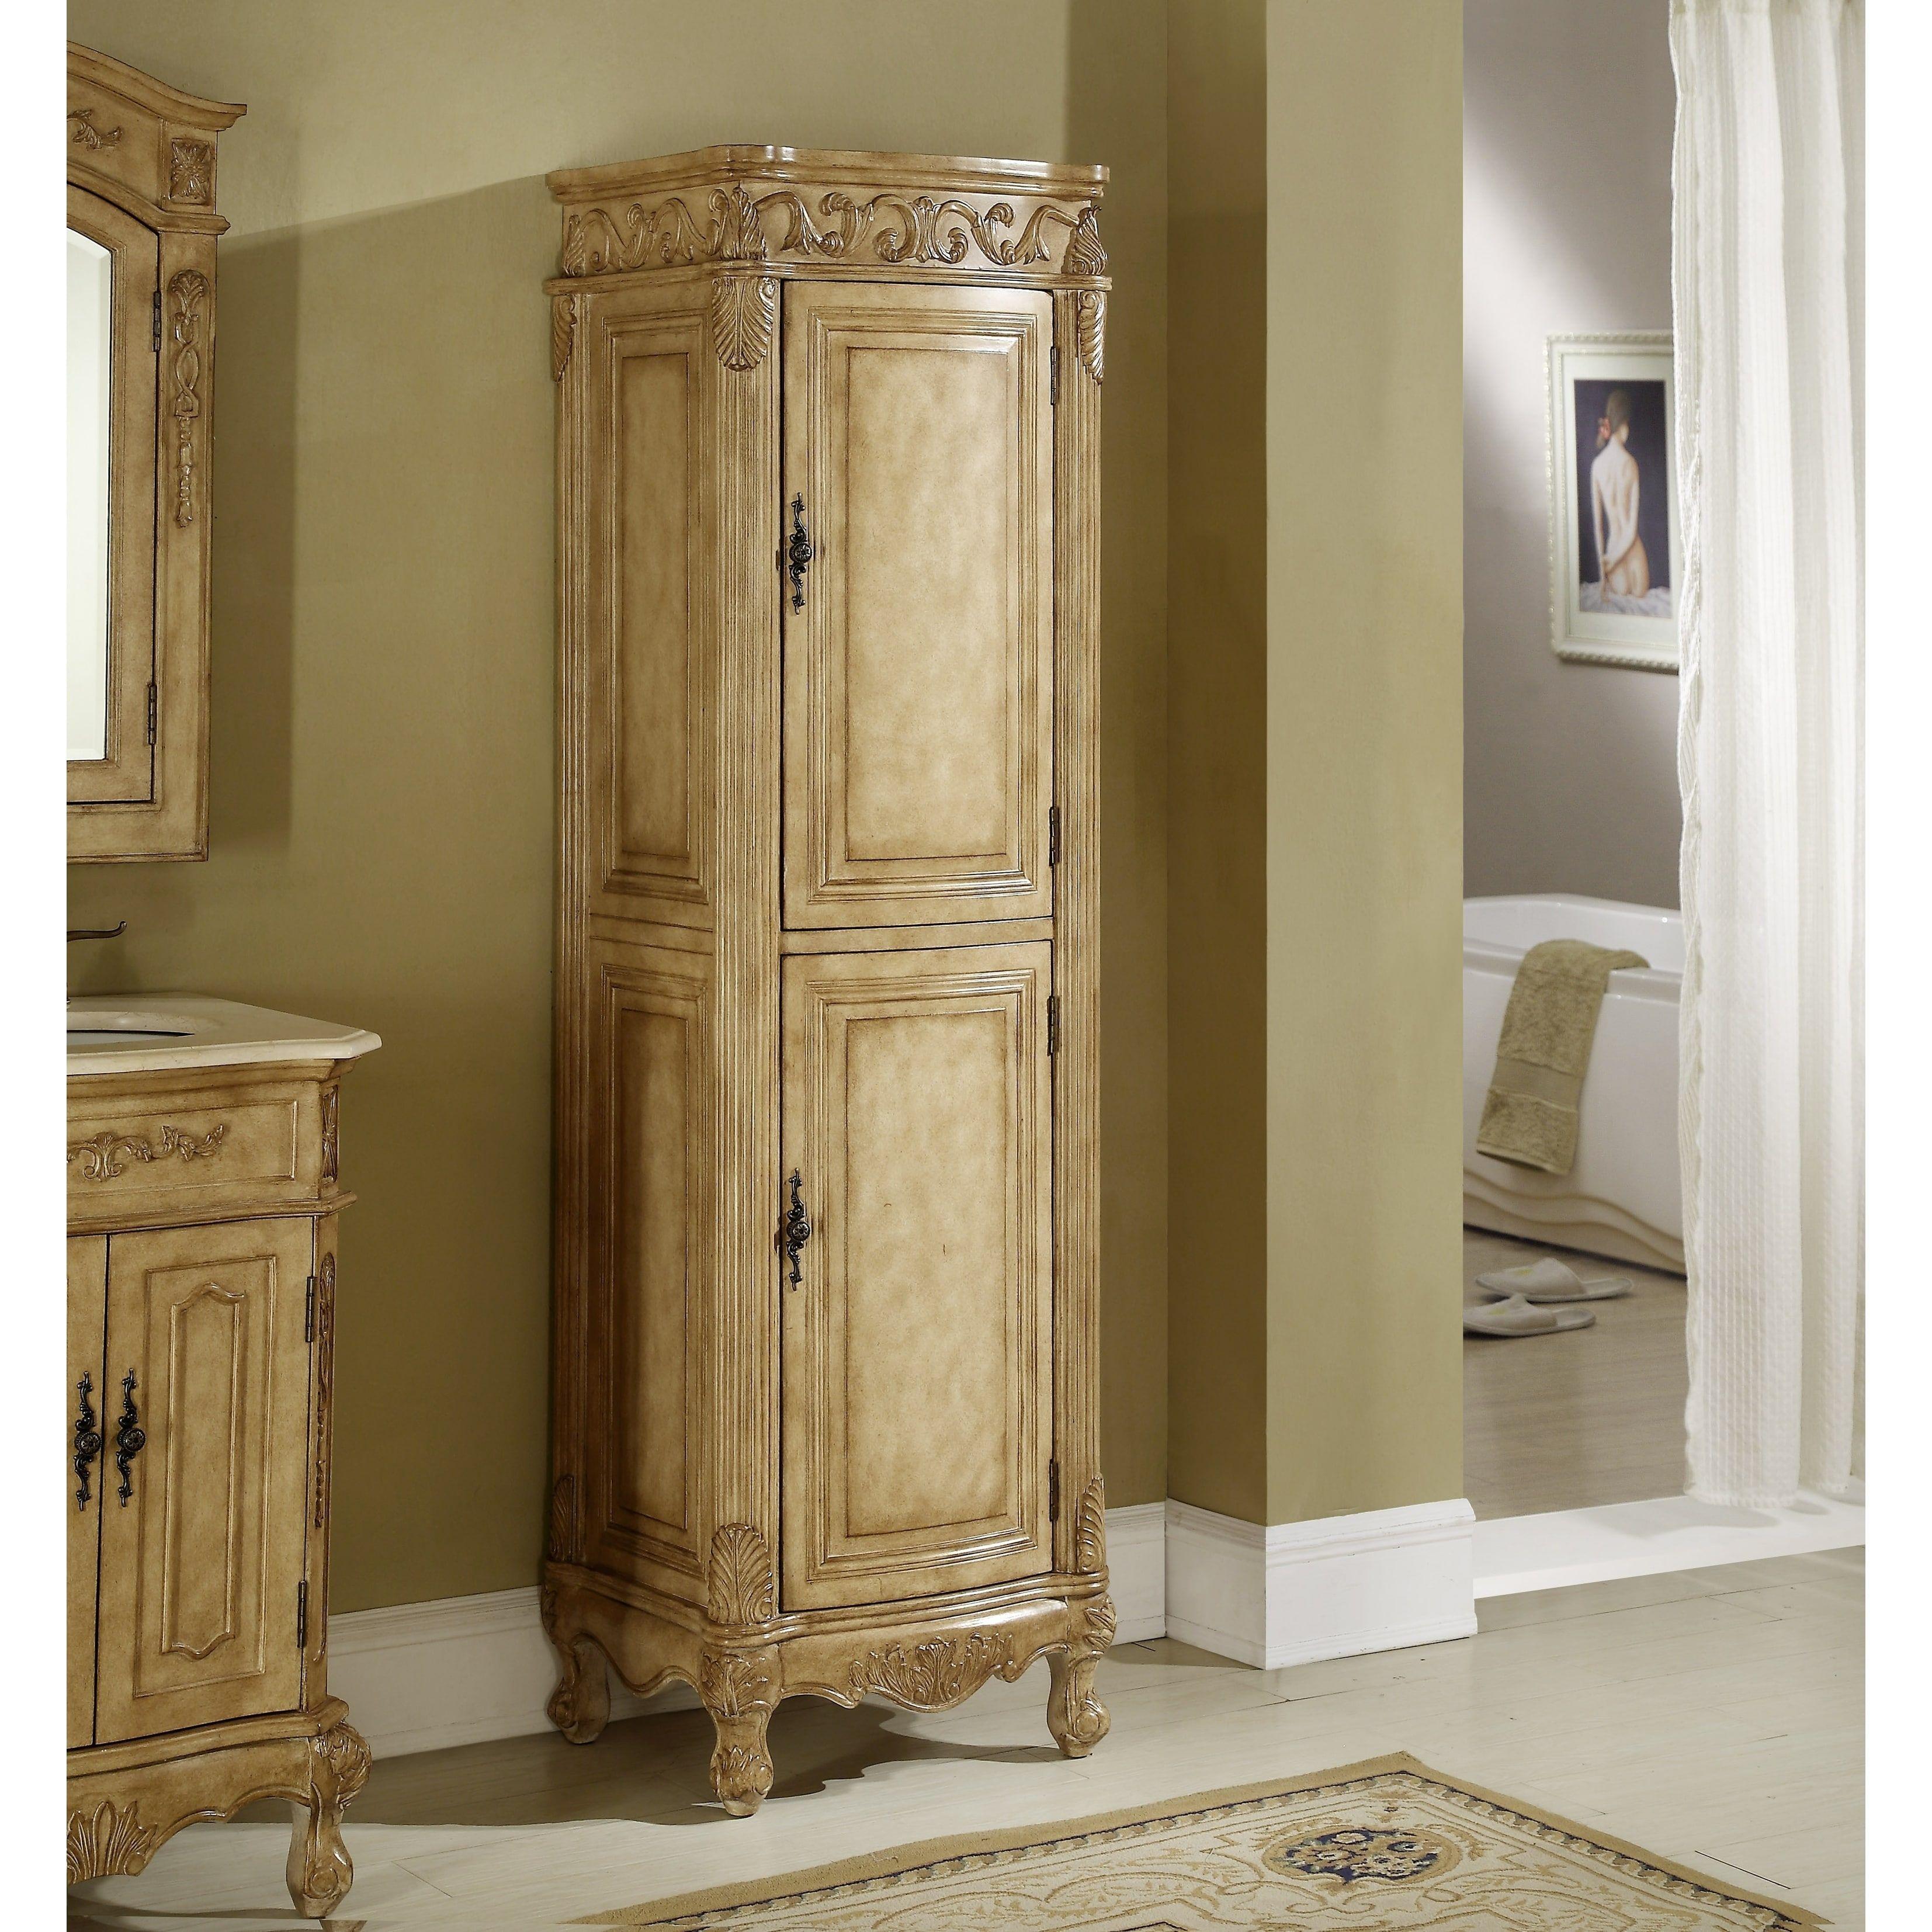 heritage roman tan birchwood cabinet size linen cabinet rh pinterest com Bathroom Linen Closet Doors Linen Closets for Bathrooms